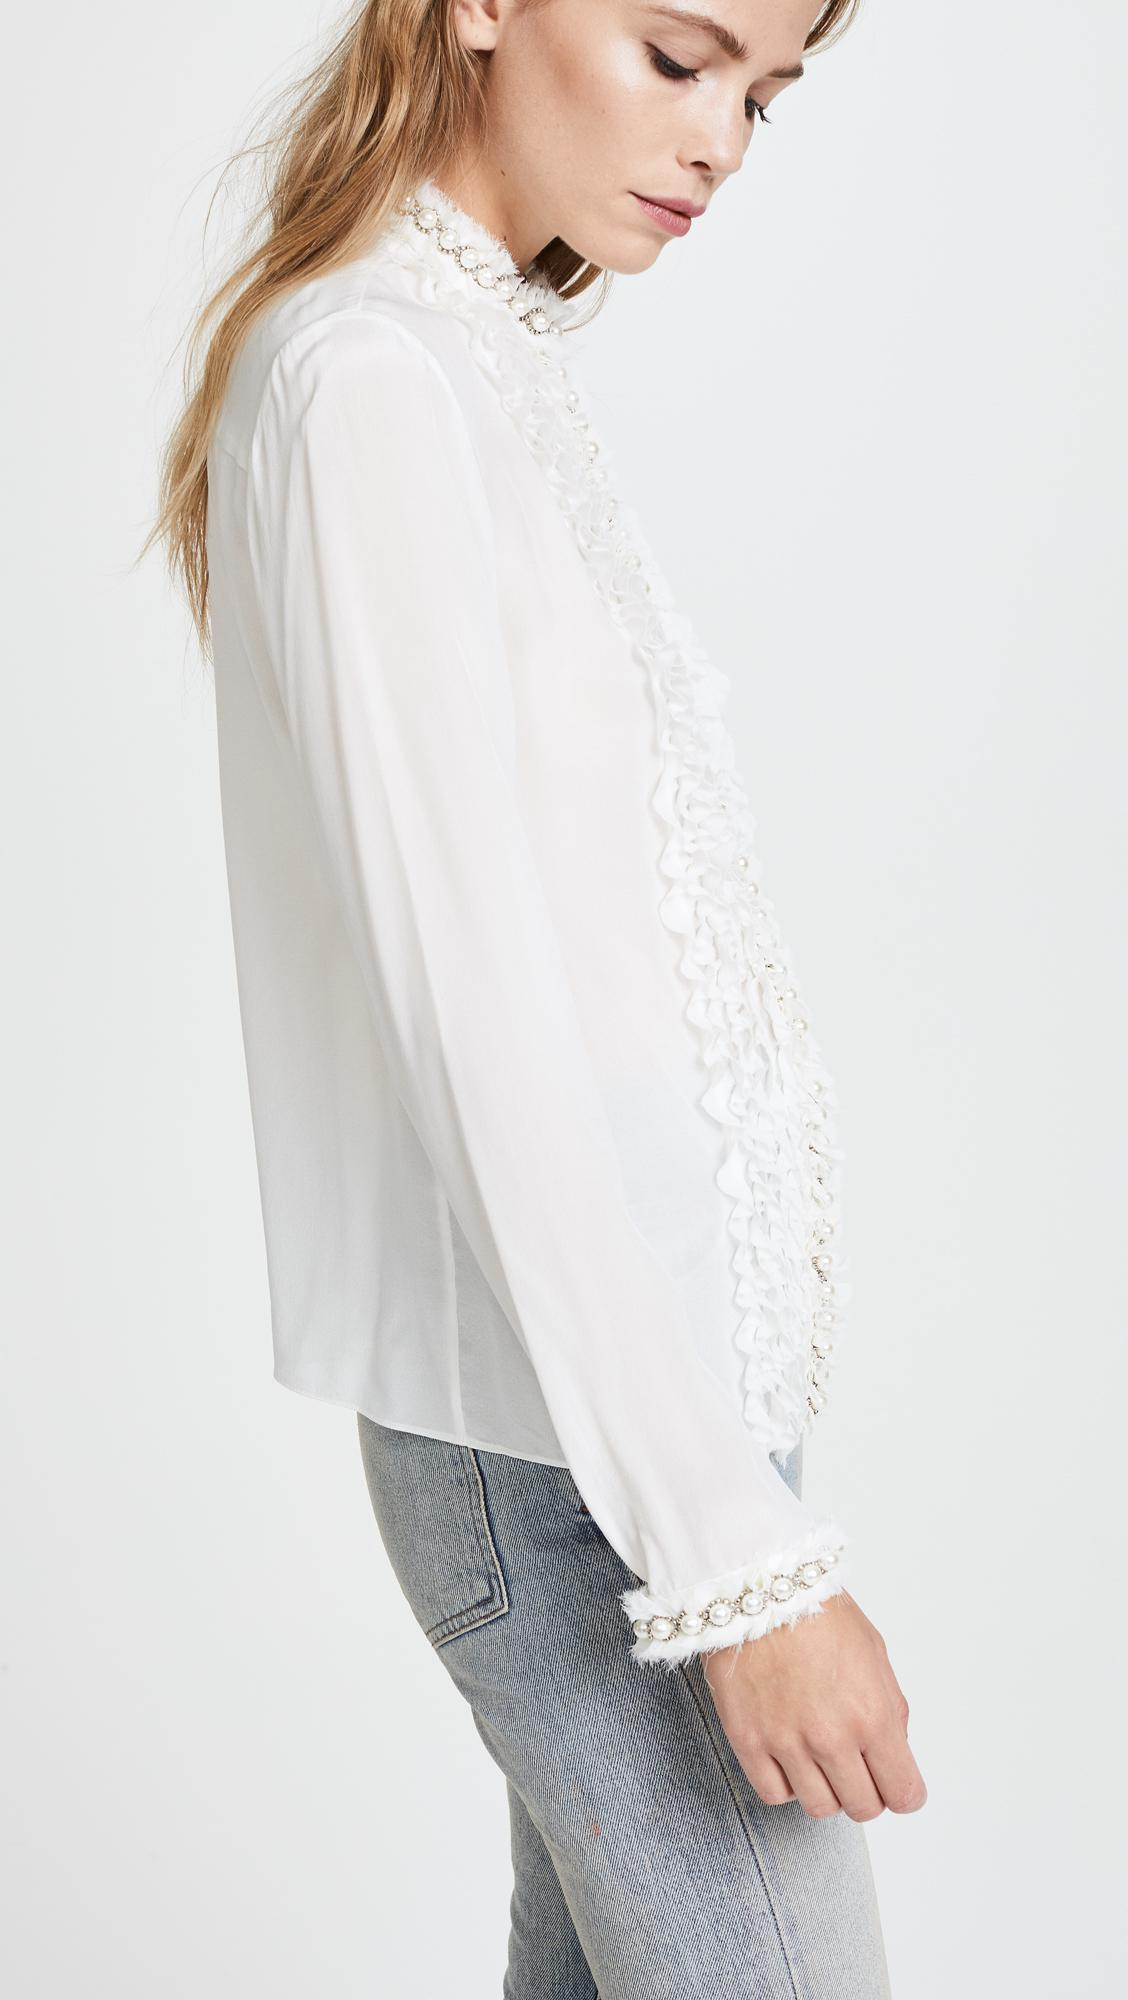 dc3cd75d685e9 Lyst - Alice + Olivia Arminda Ruffle Imitation Pearl Blouse in White